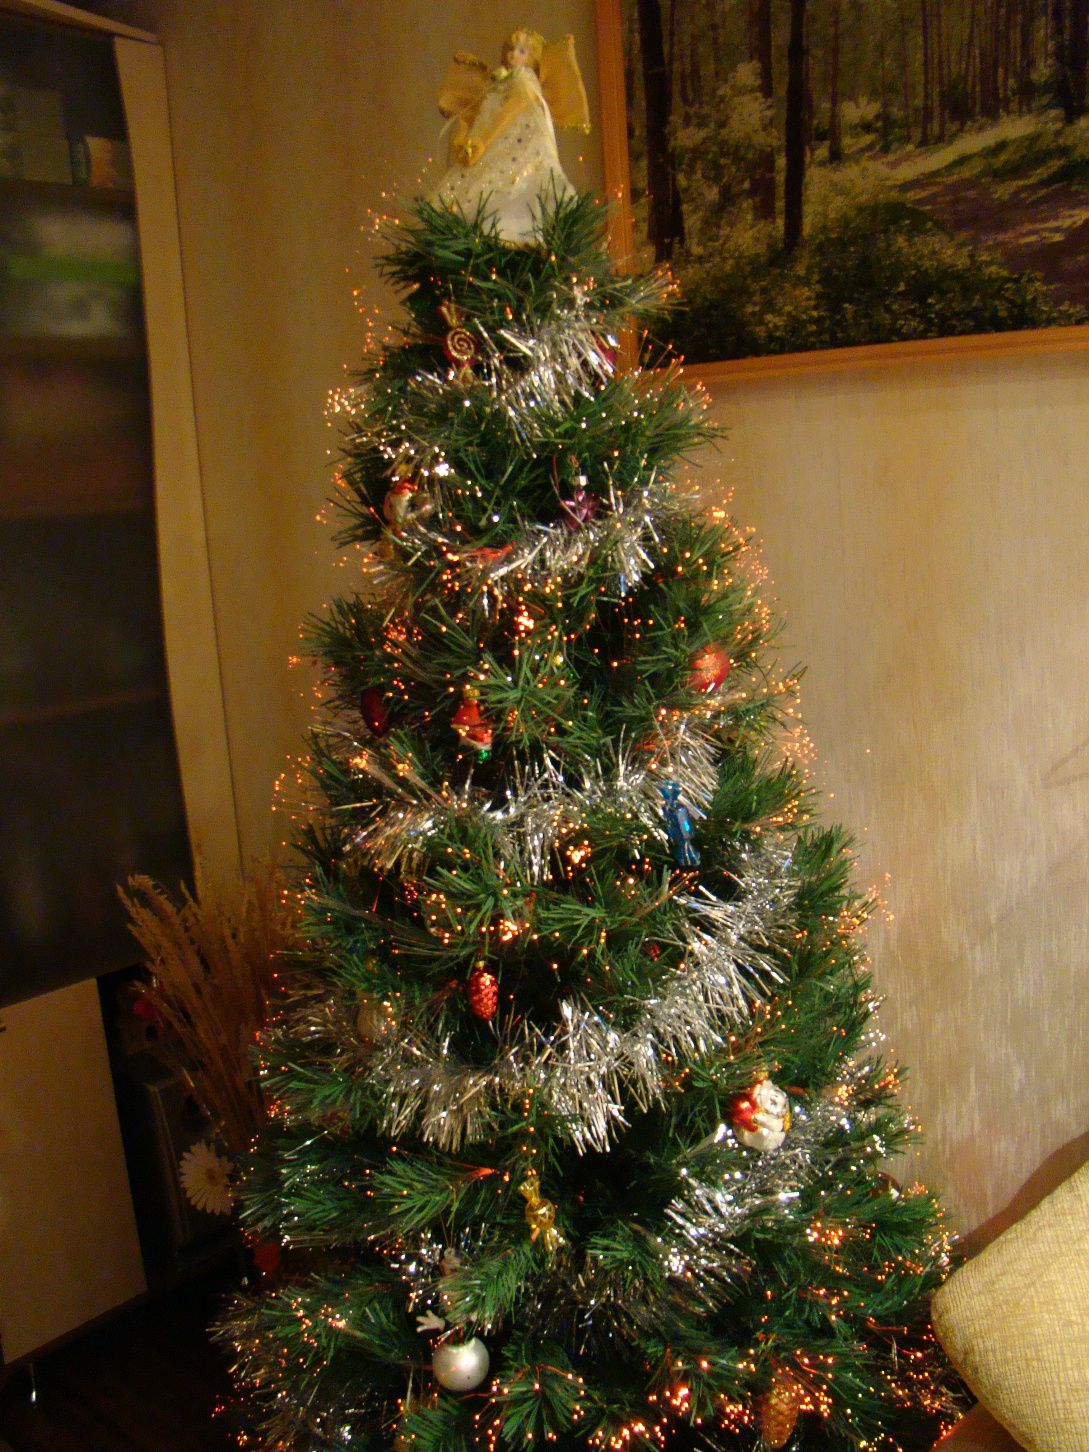 catНовогодняя елка1 (1).jpg